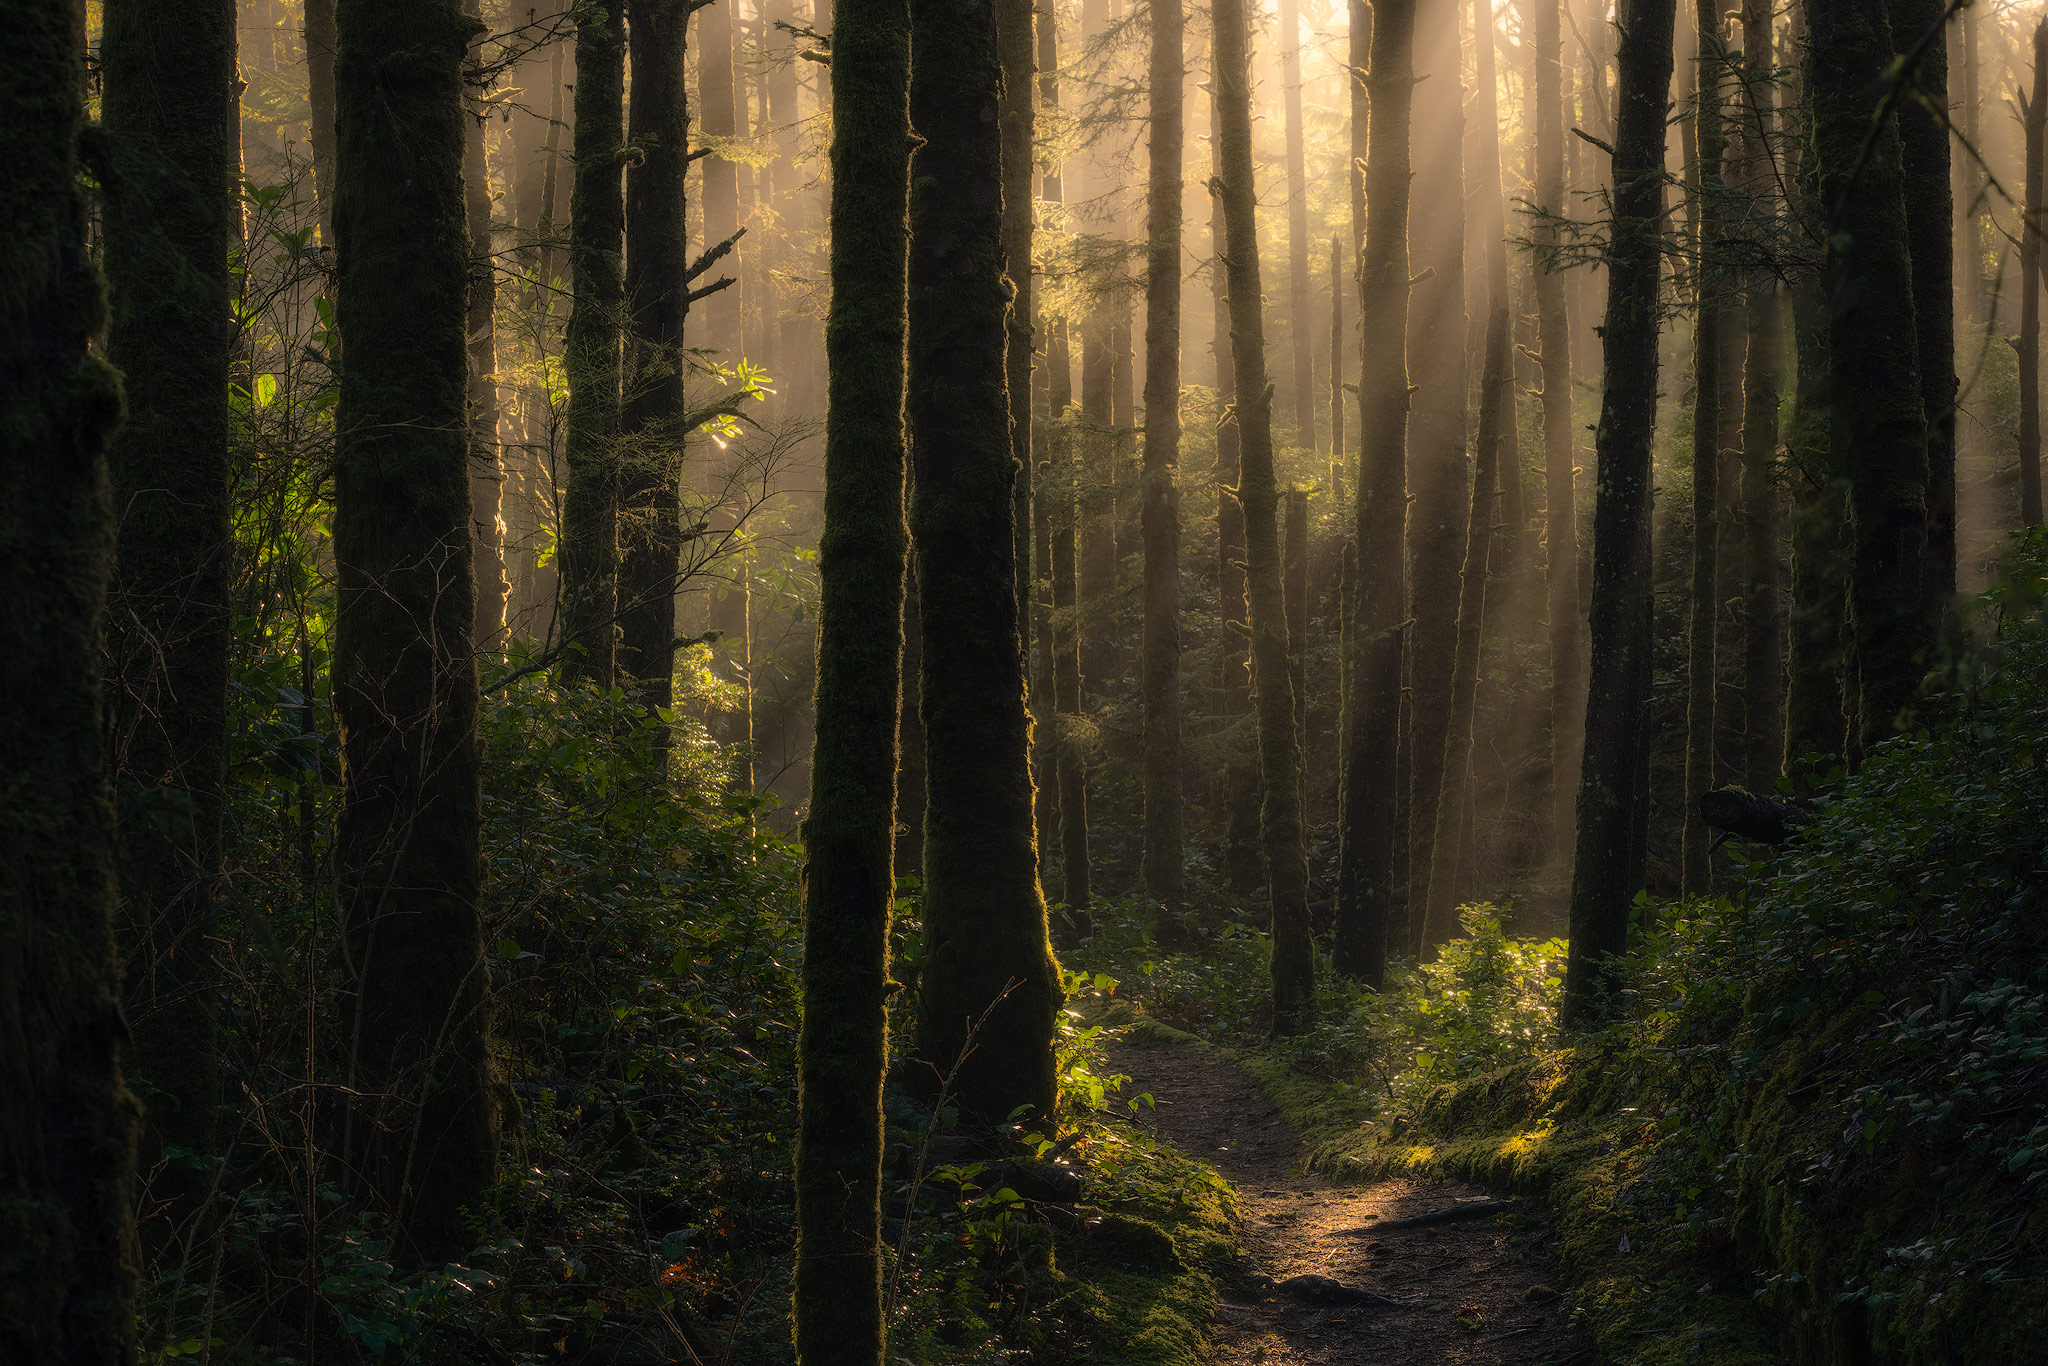 mistborn-forest.jpg